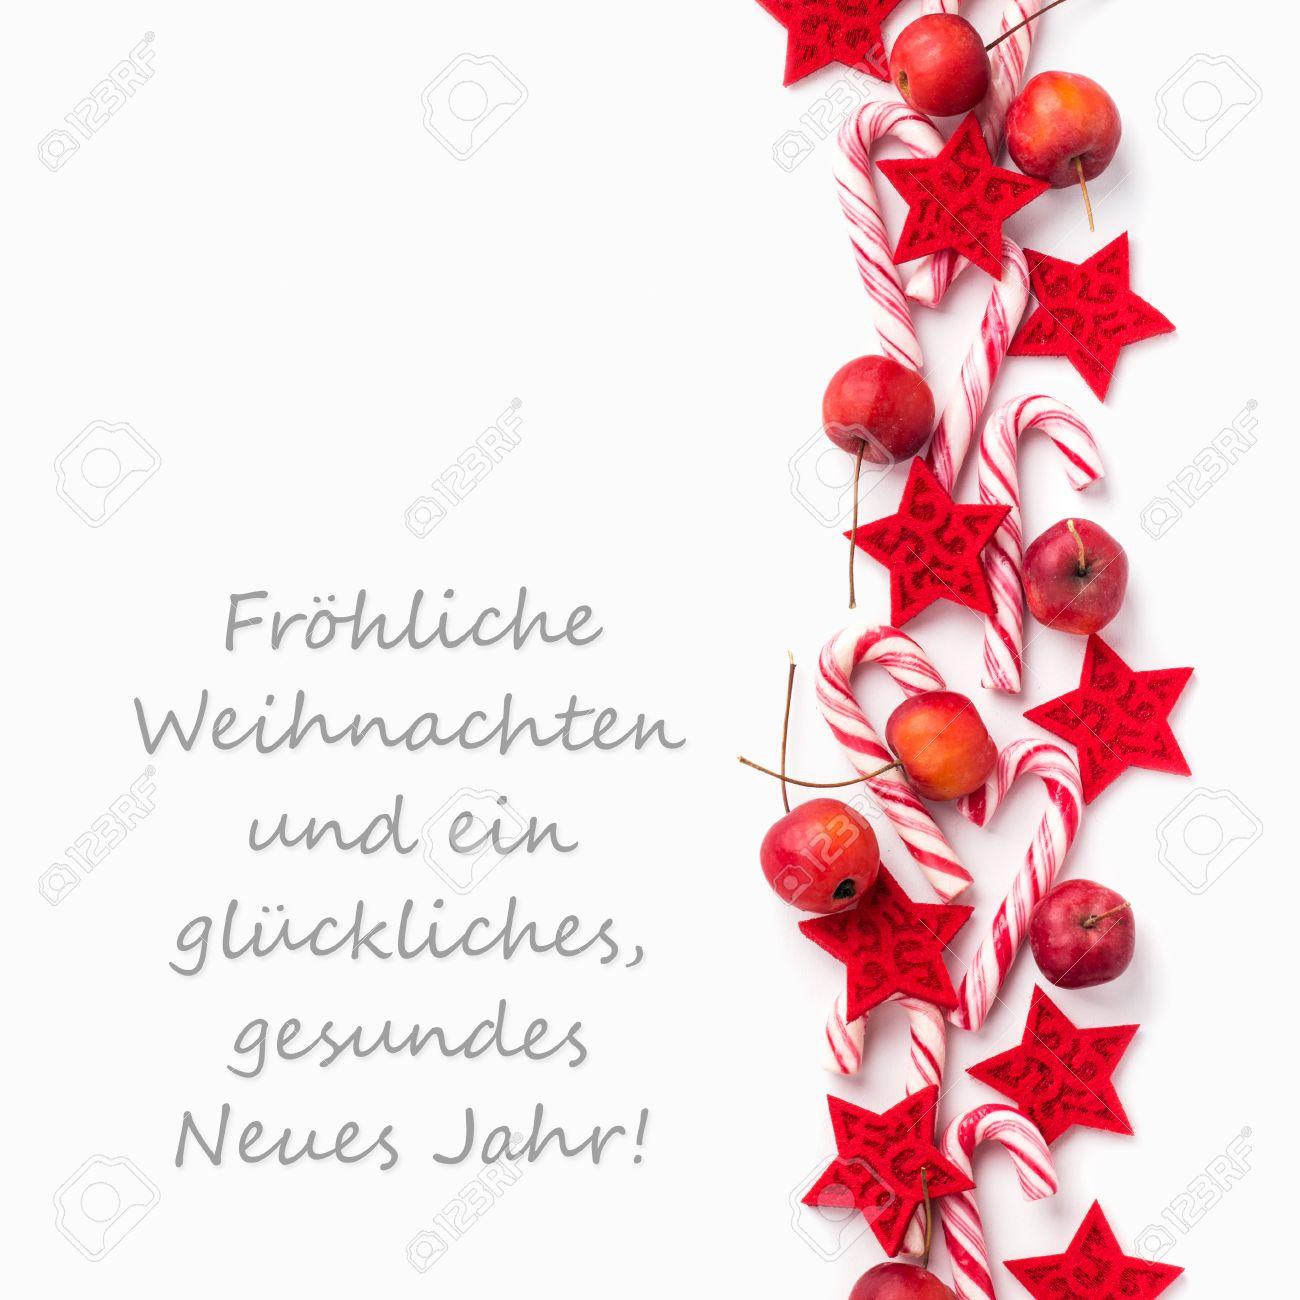 Text Frohe Weihnachten.Stock Photo